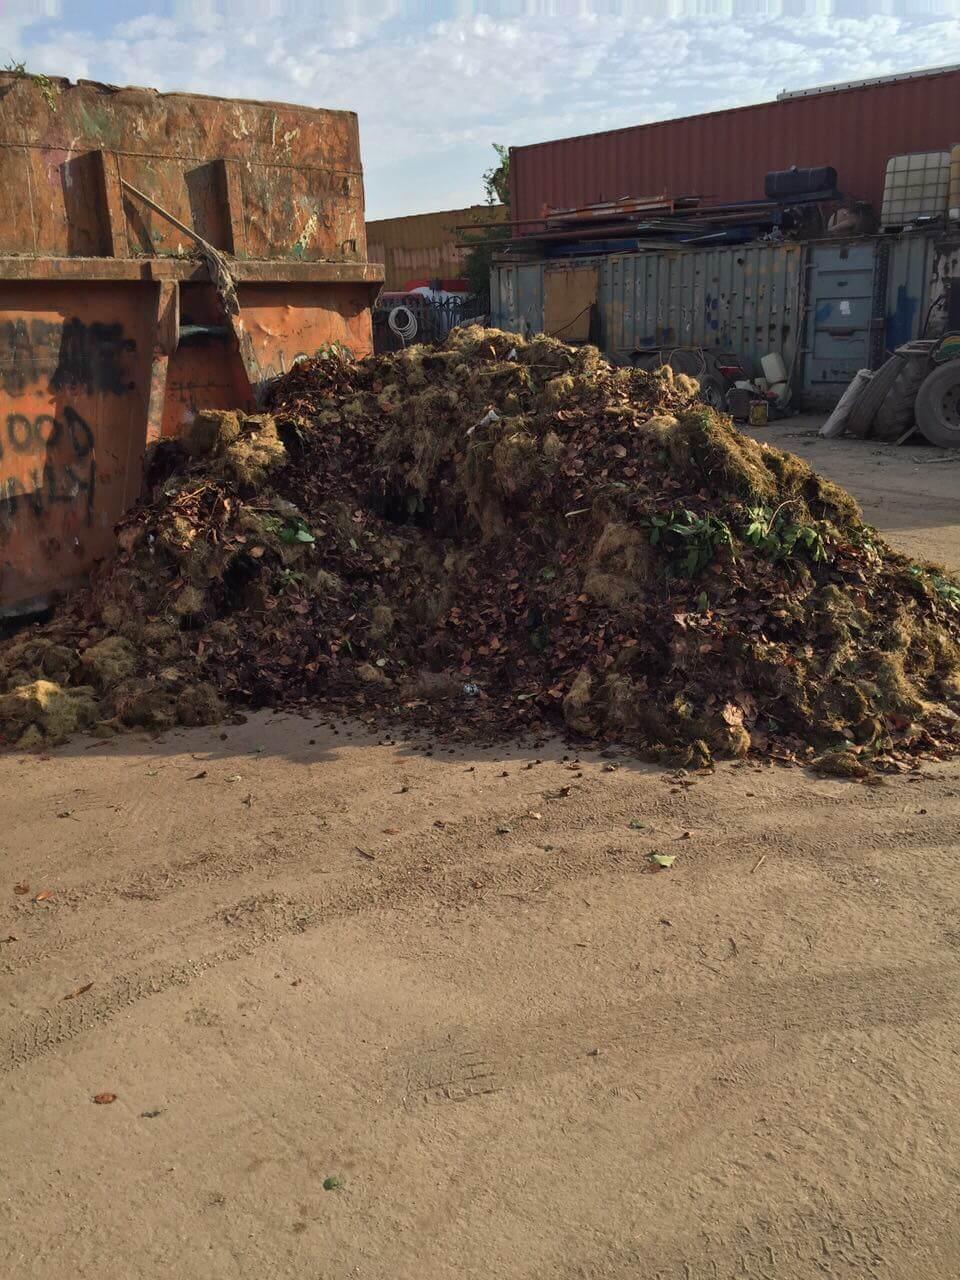 Junk Recycling Brixton